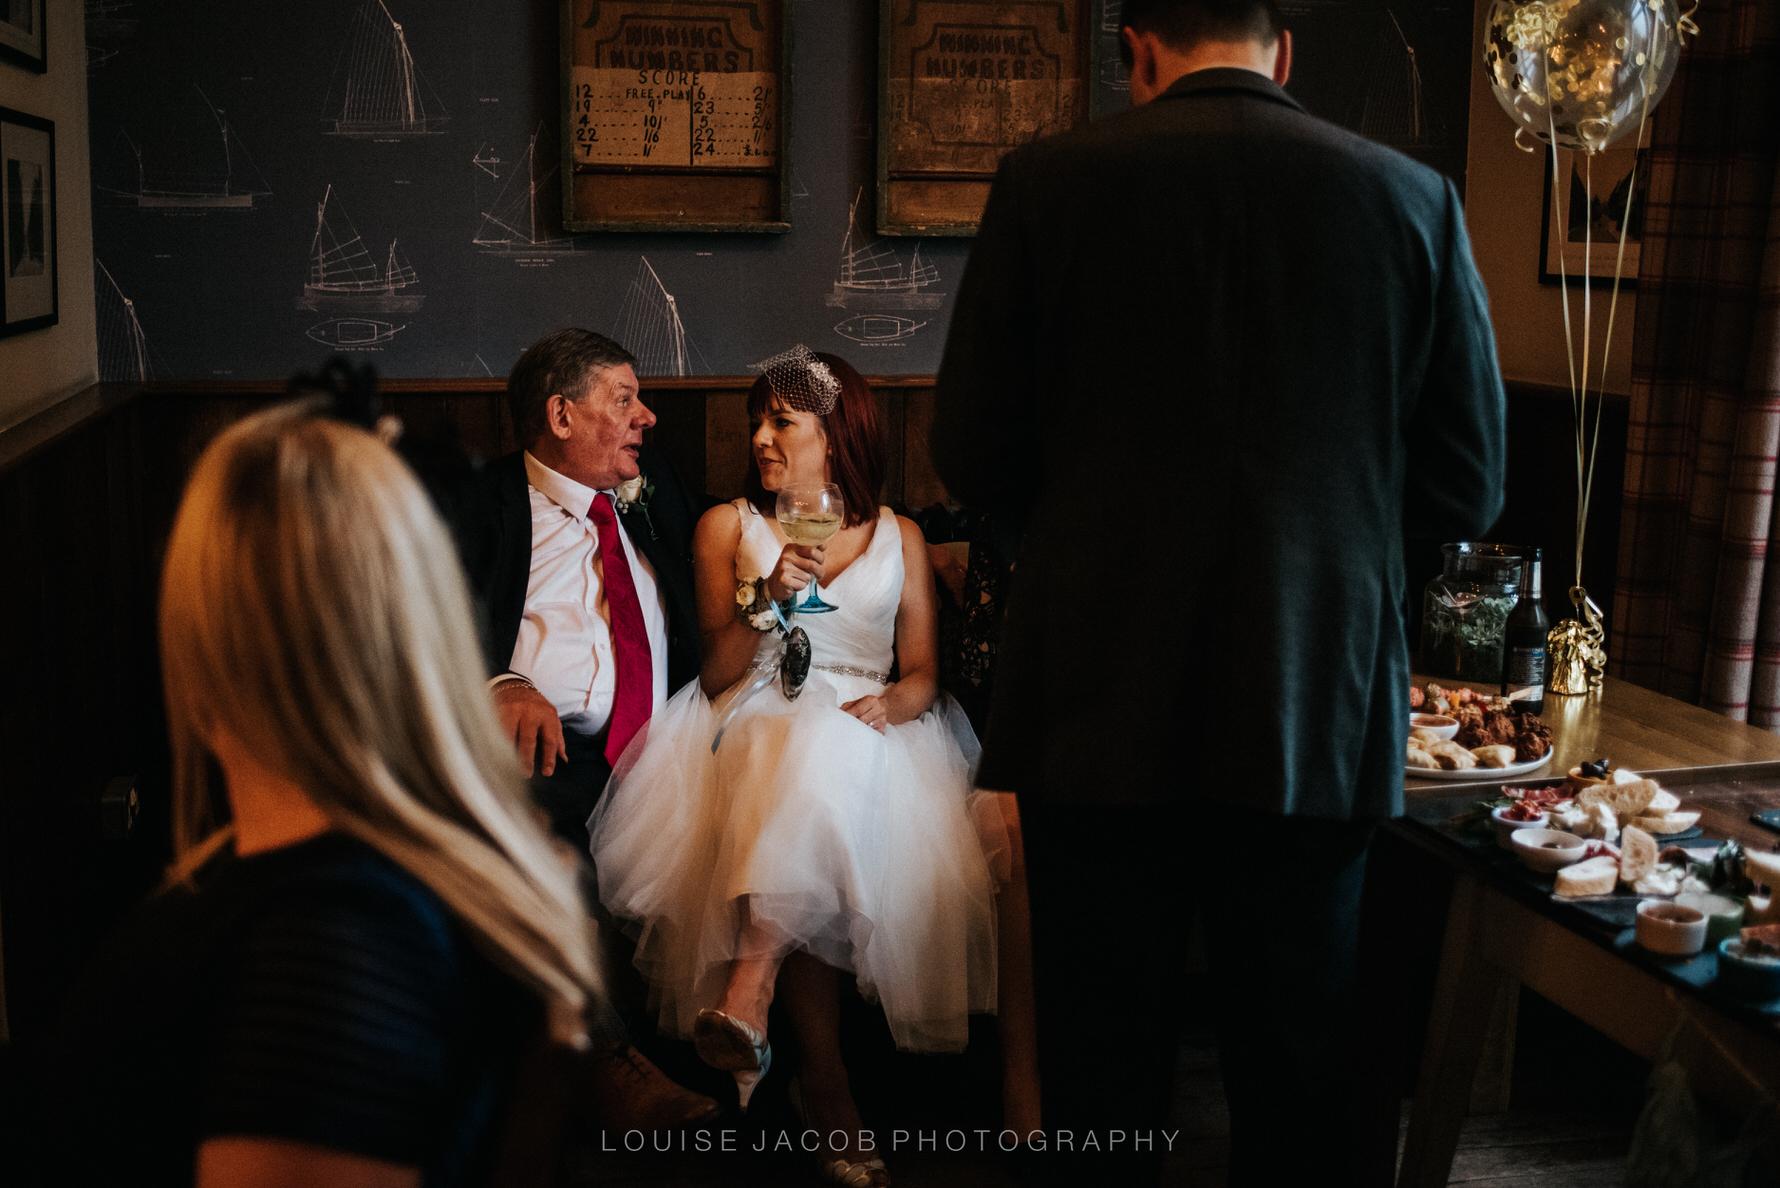 Unposed Documentary Wedding Photography